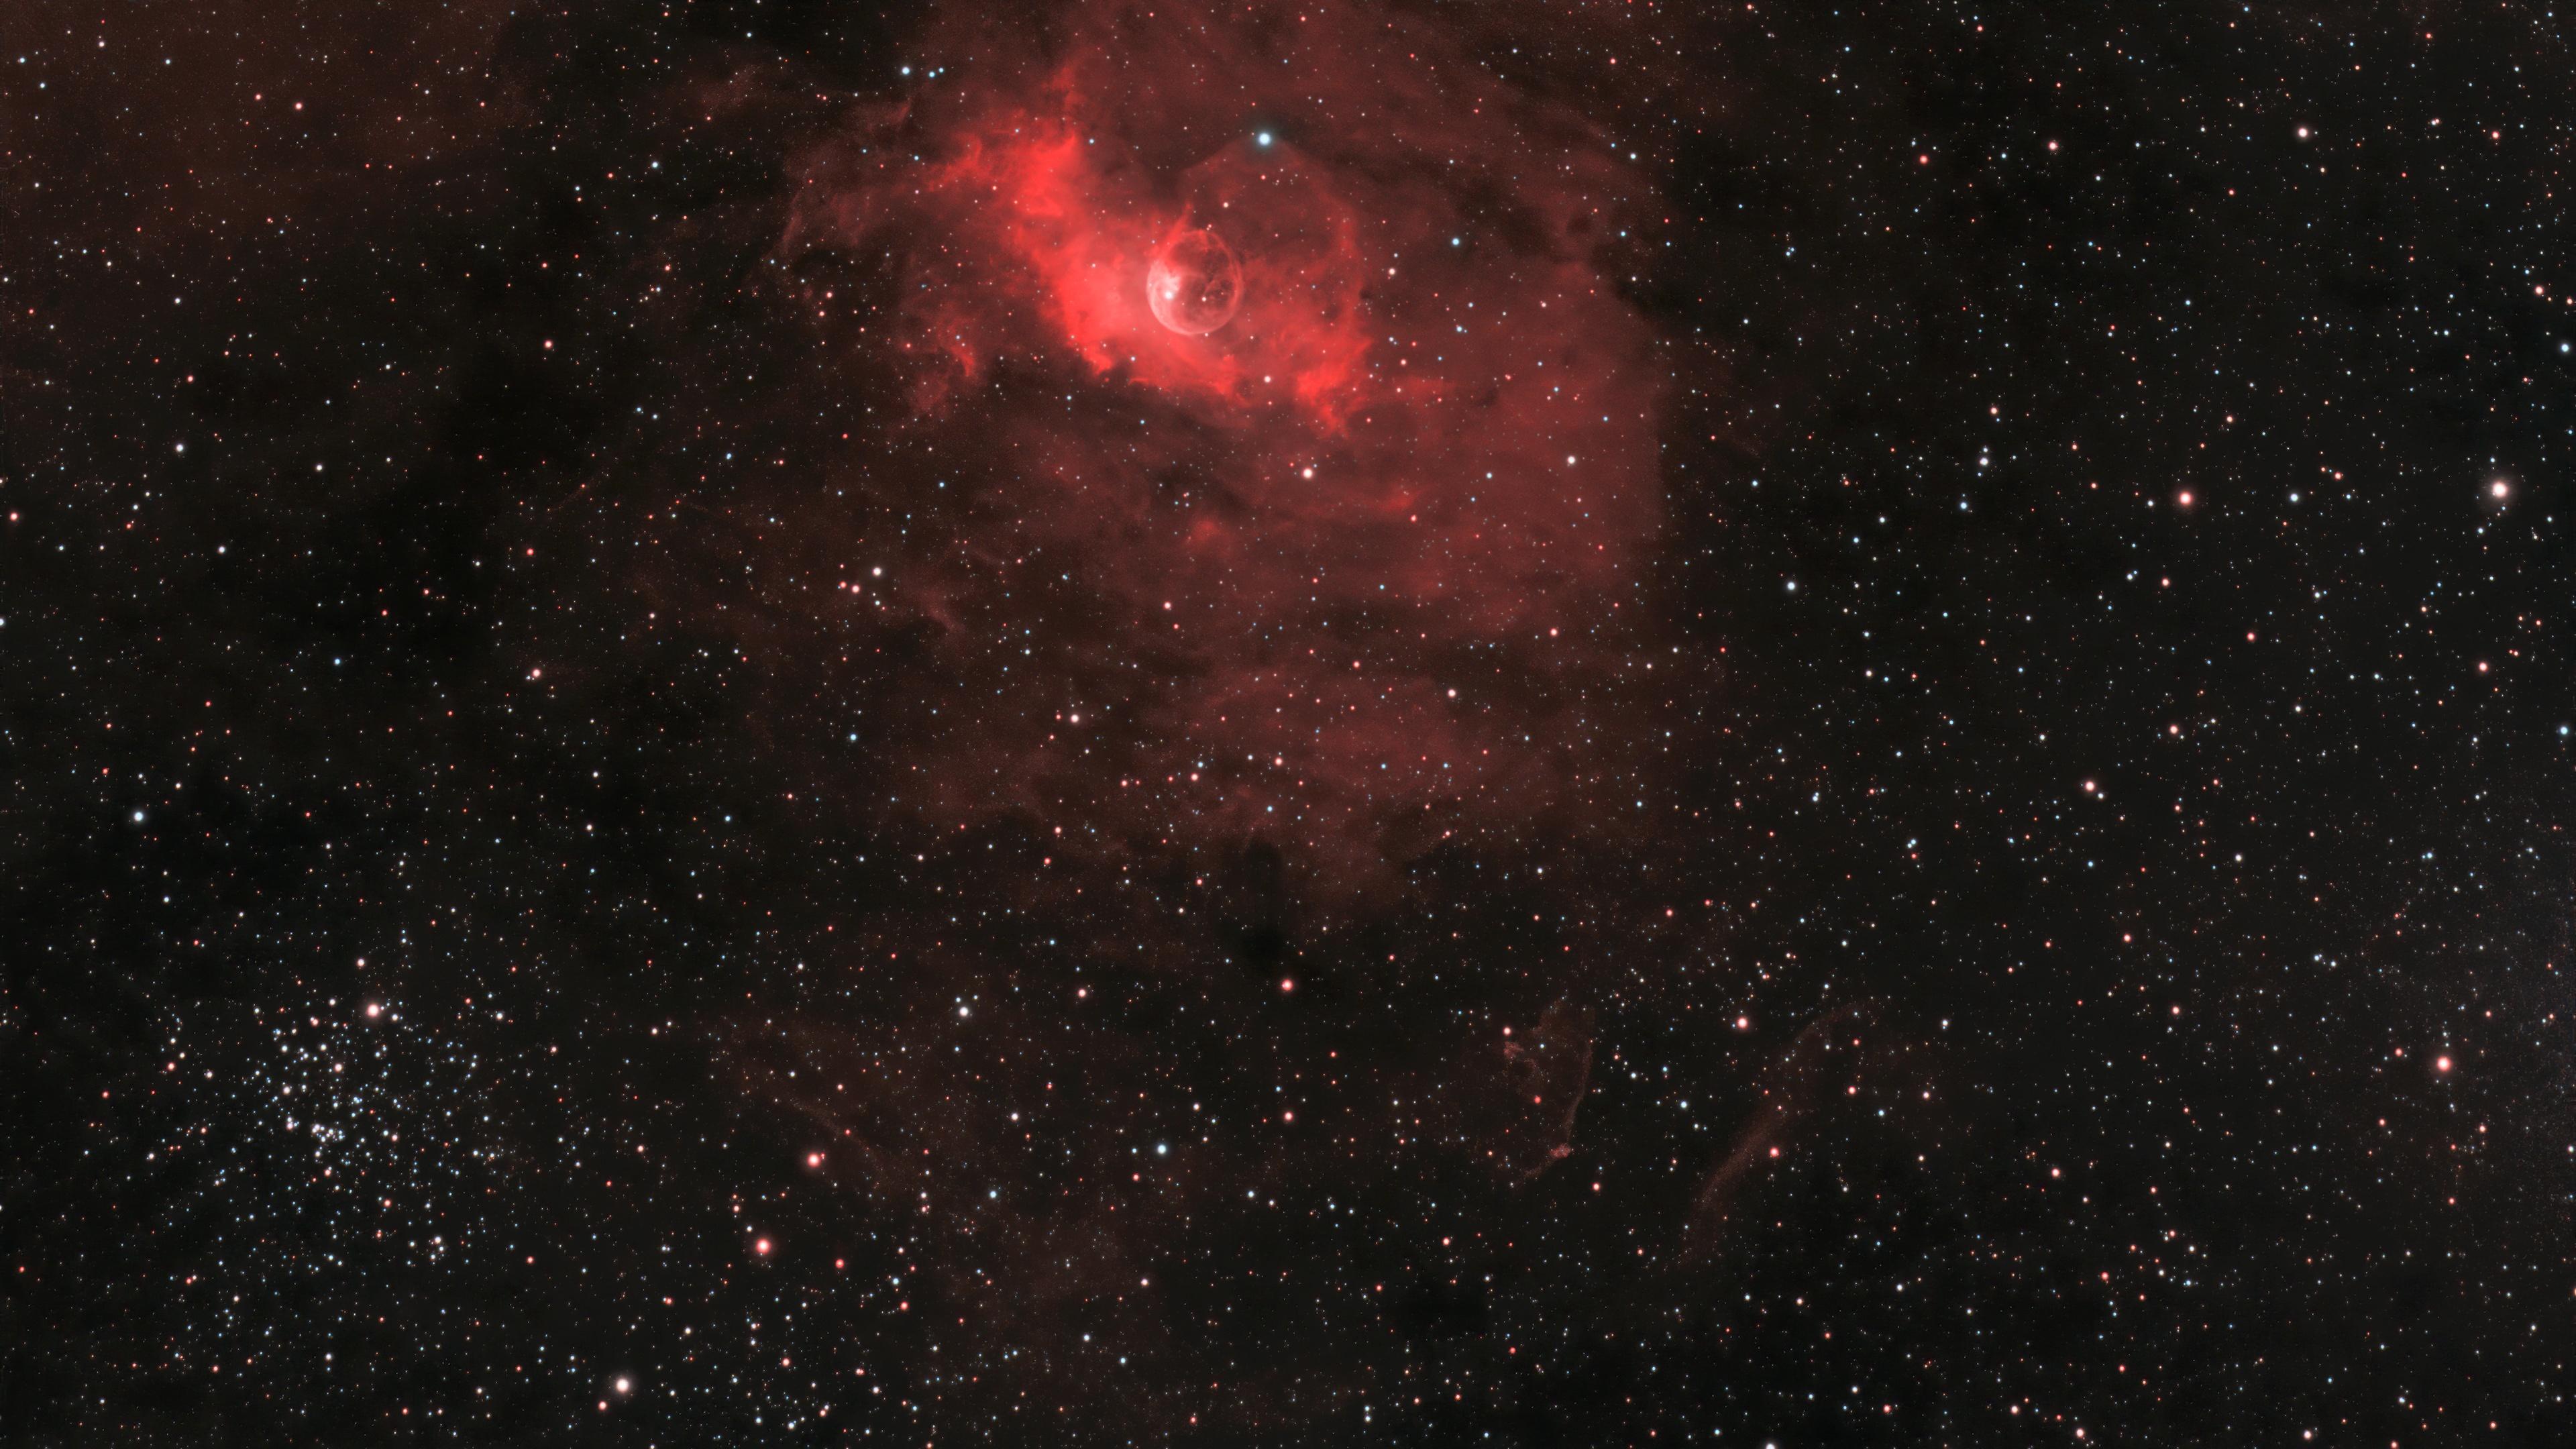 NGC7635_20x180s_HOO6nm_denoise.jpg